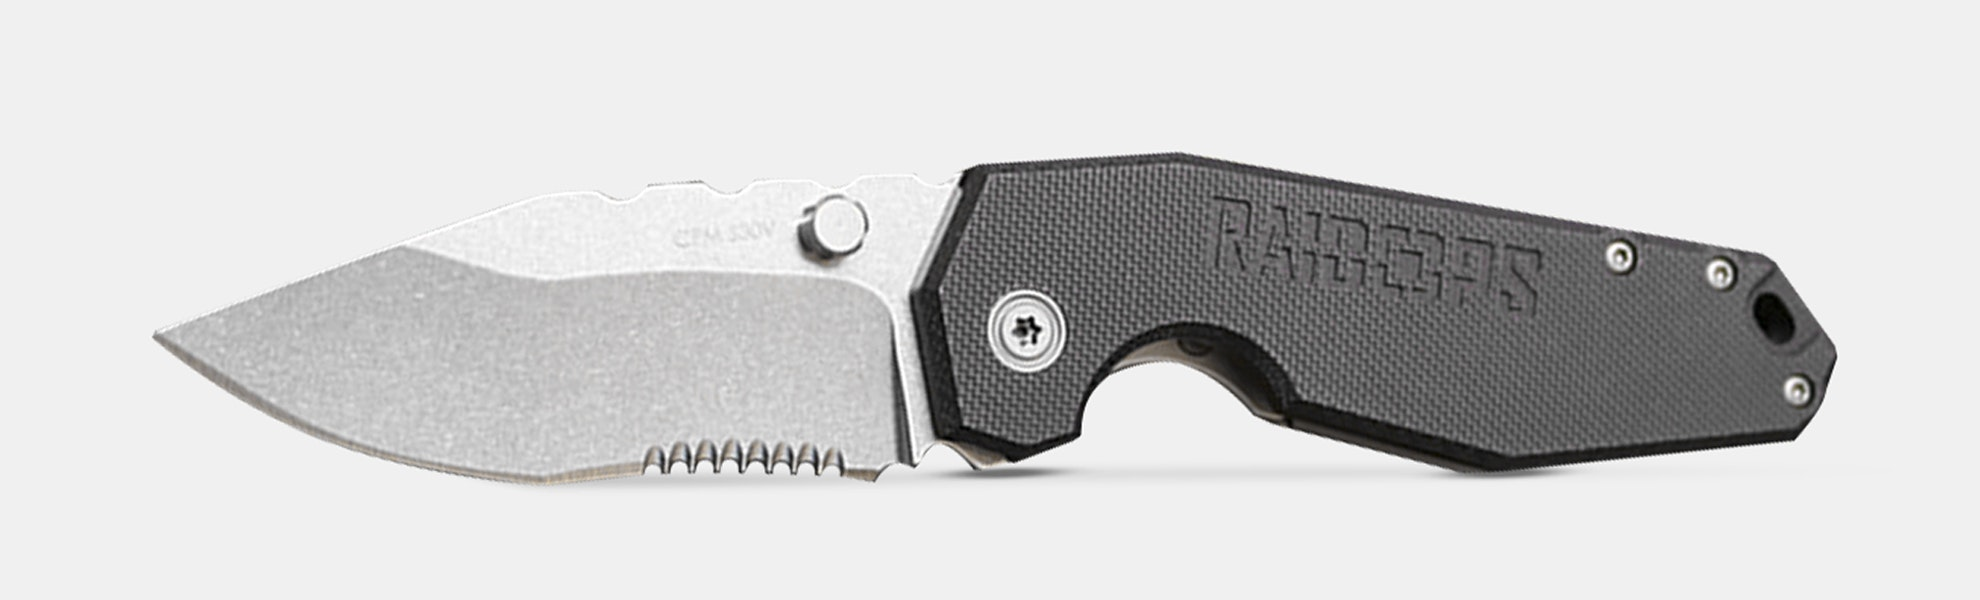 Raidops Aquilo S30V & G-10 Folding Knife